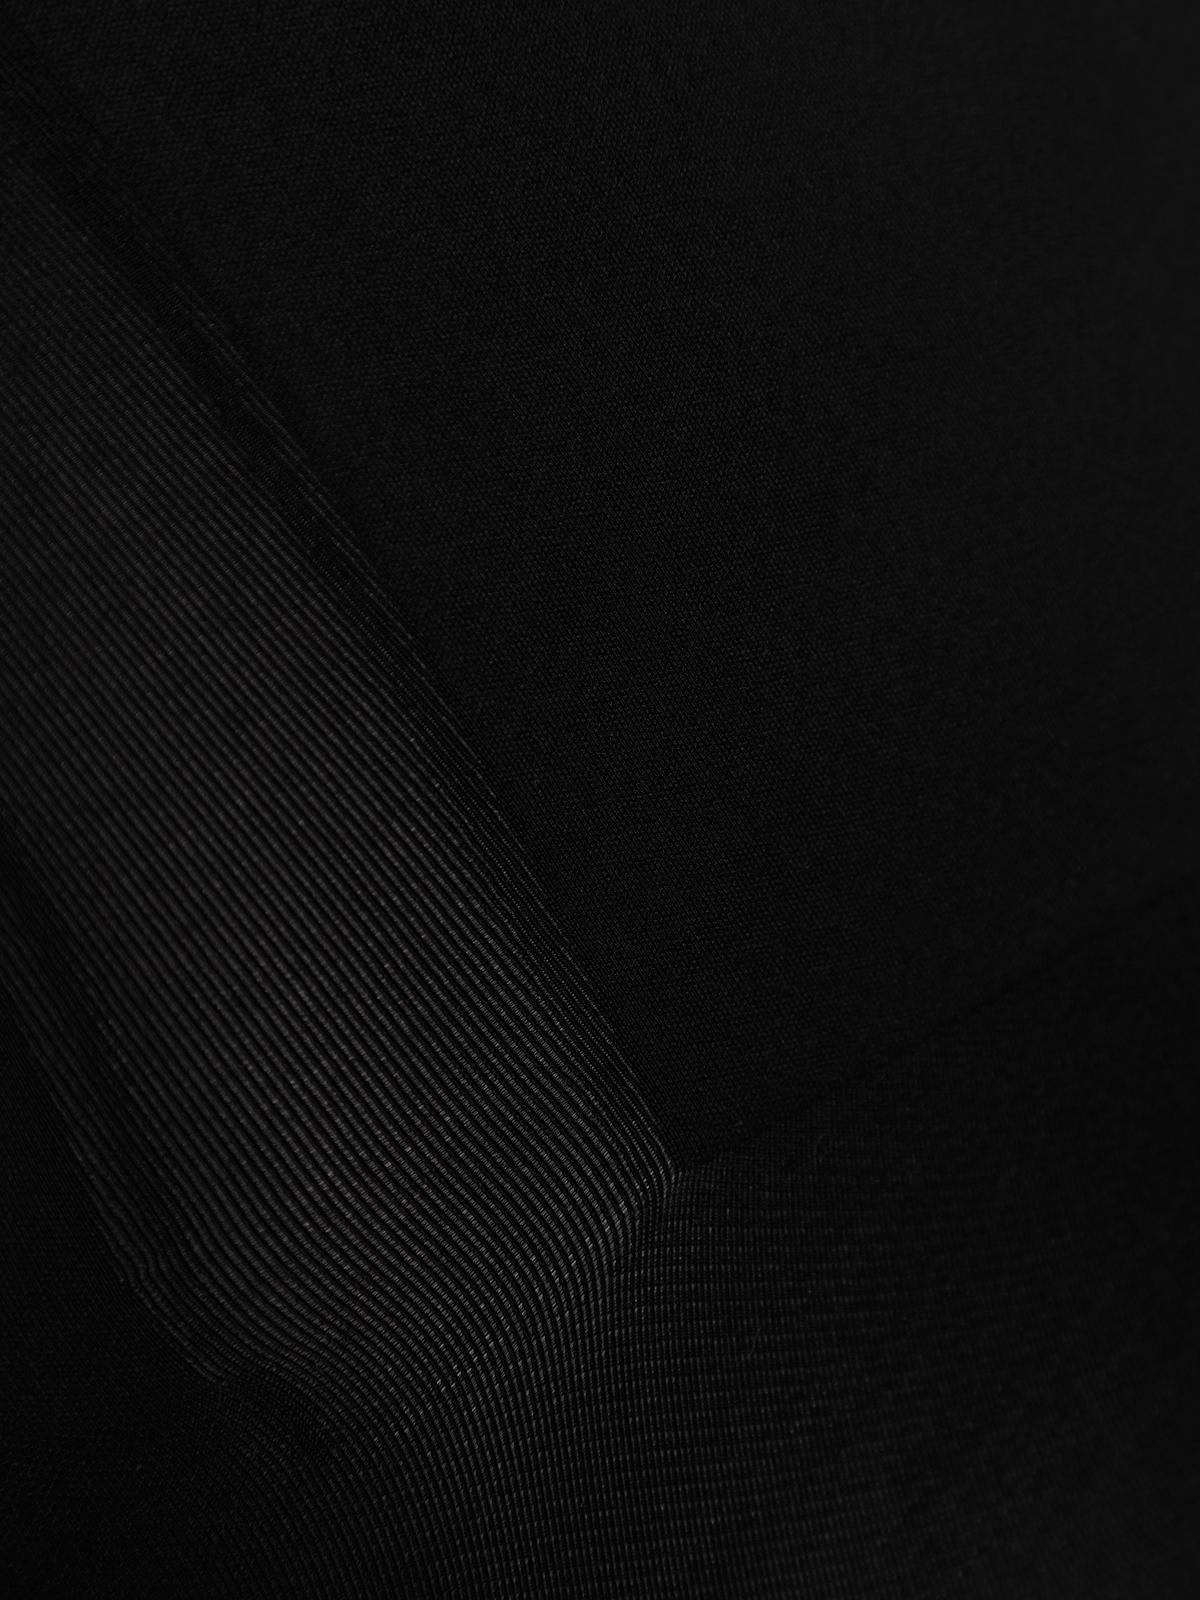 Up Under Contour Ultra High Waist Brief Black